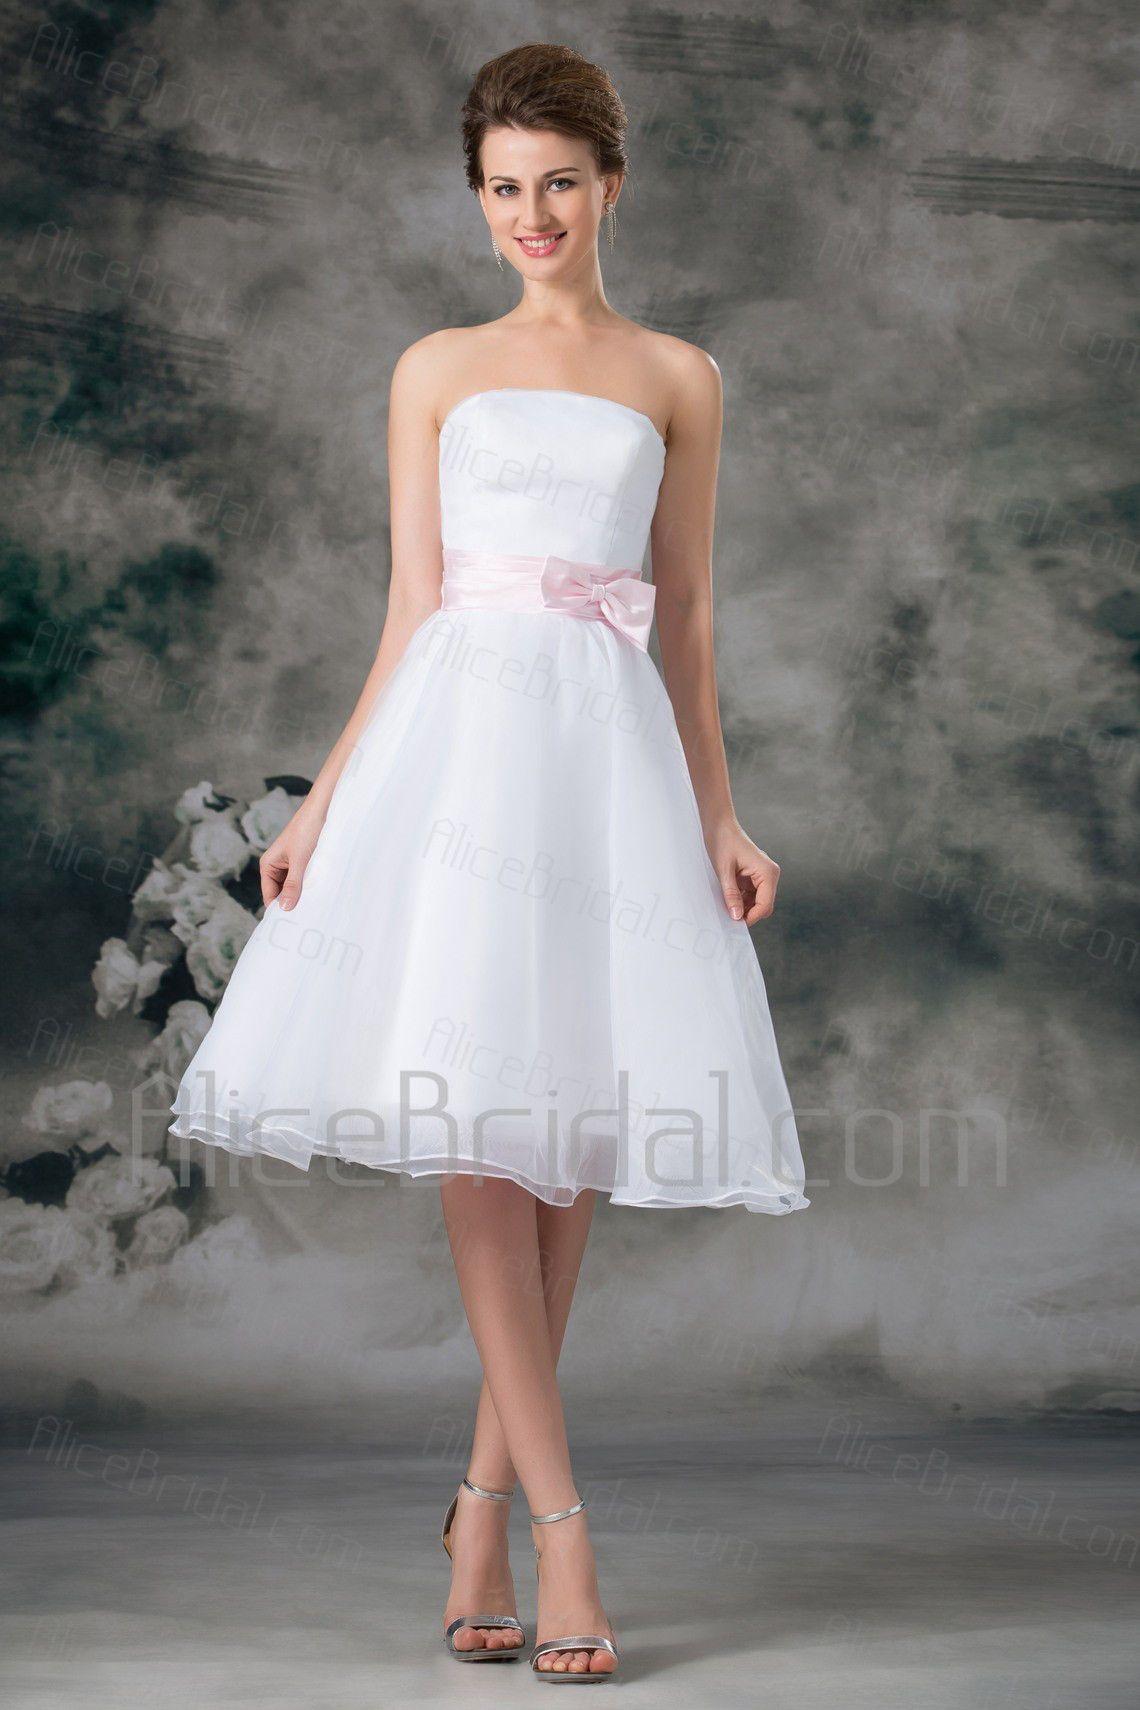 Organza Strapless Knee Length A Line Sash Short Wedding Dress Organza Bridal Bow Wedding Dress Wedding Dresses [ 1710 x 1140 Pixel ]